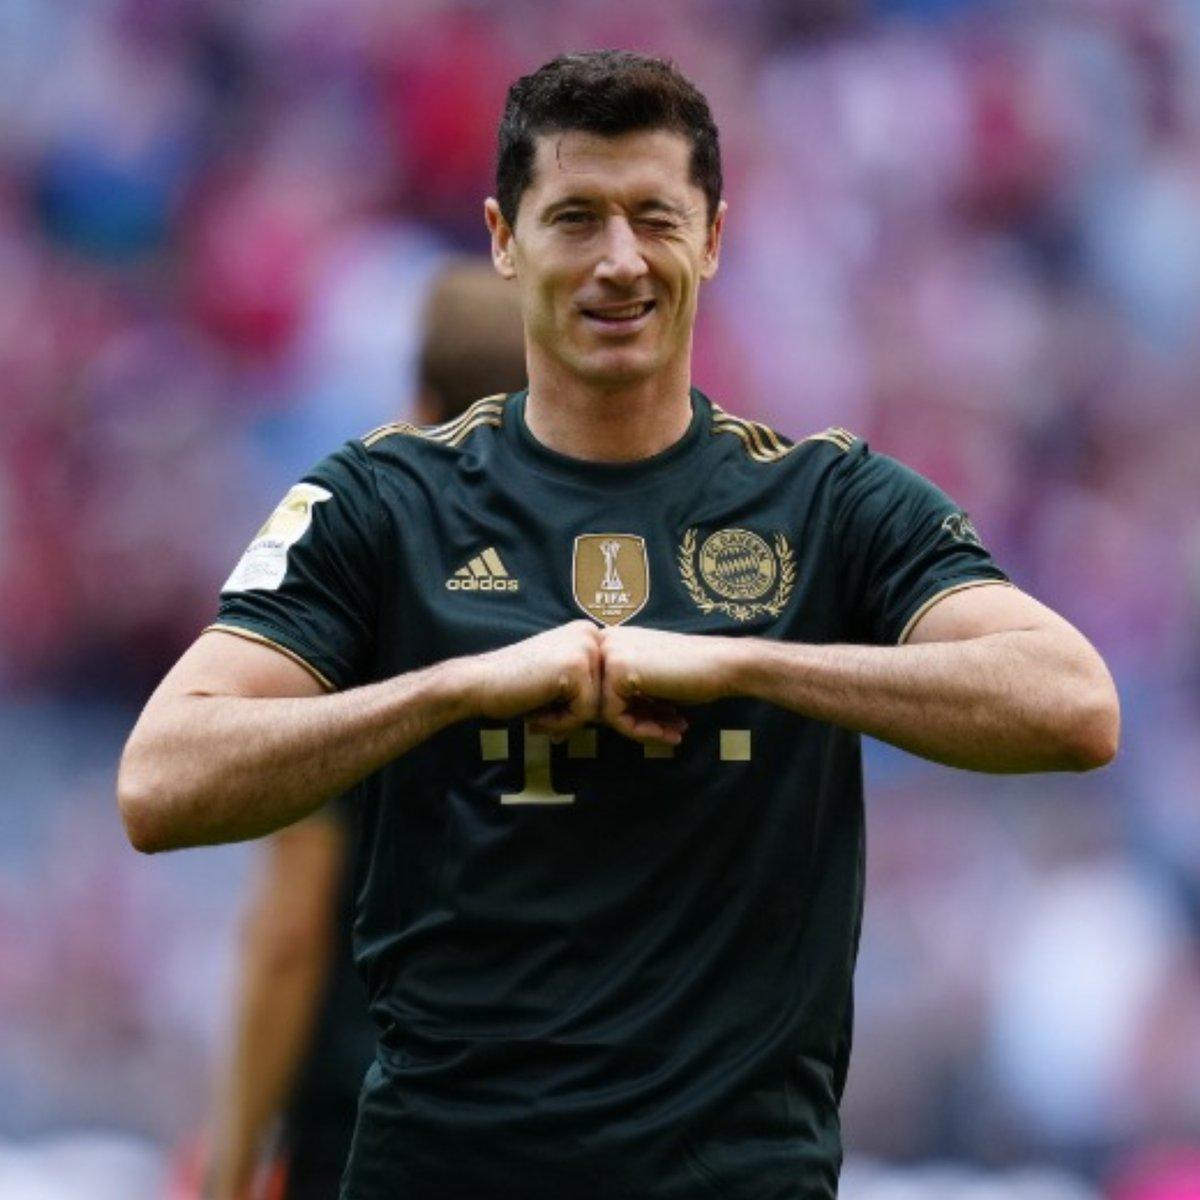 @InvictosSomos's photo on Bayern